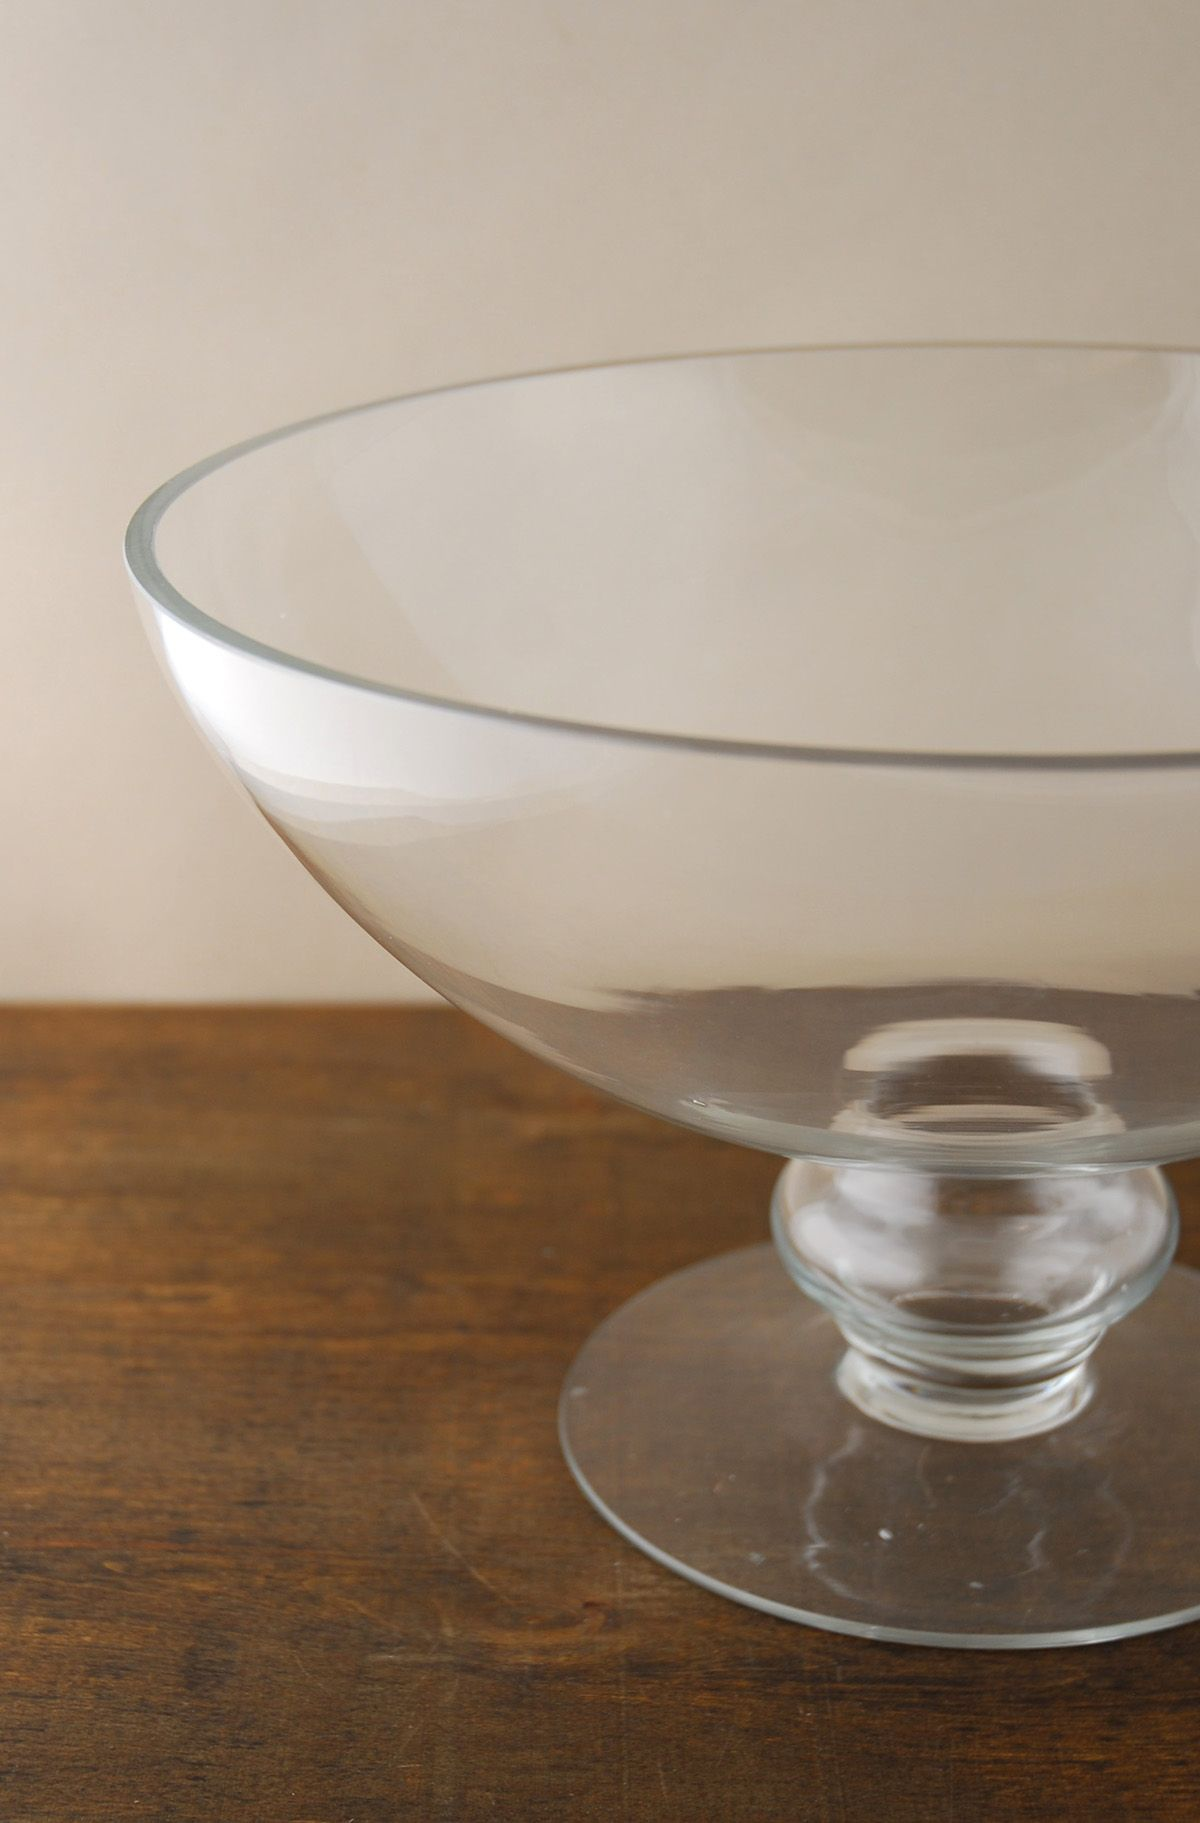 Pedestal 12 Glass Bowl Centerpiece Bowls Floating Flower Bowls Bowl Flower Bowl Centerpiece Bowl